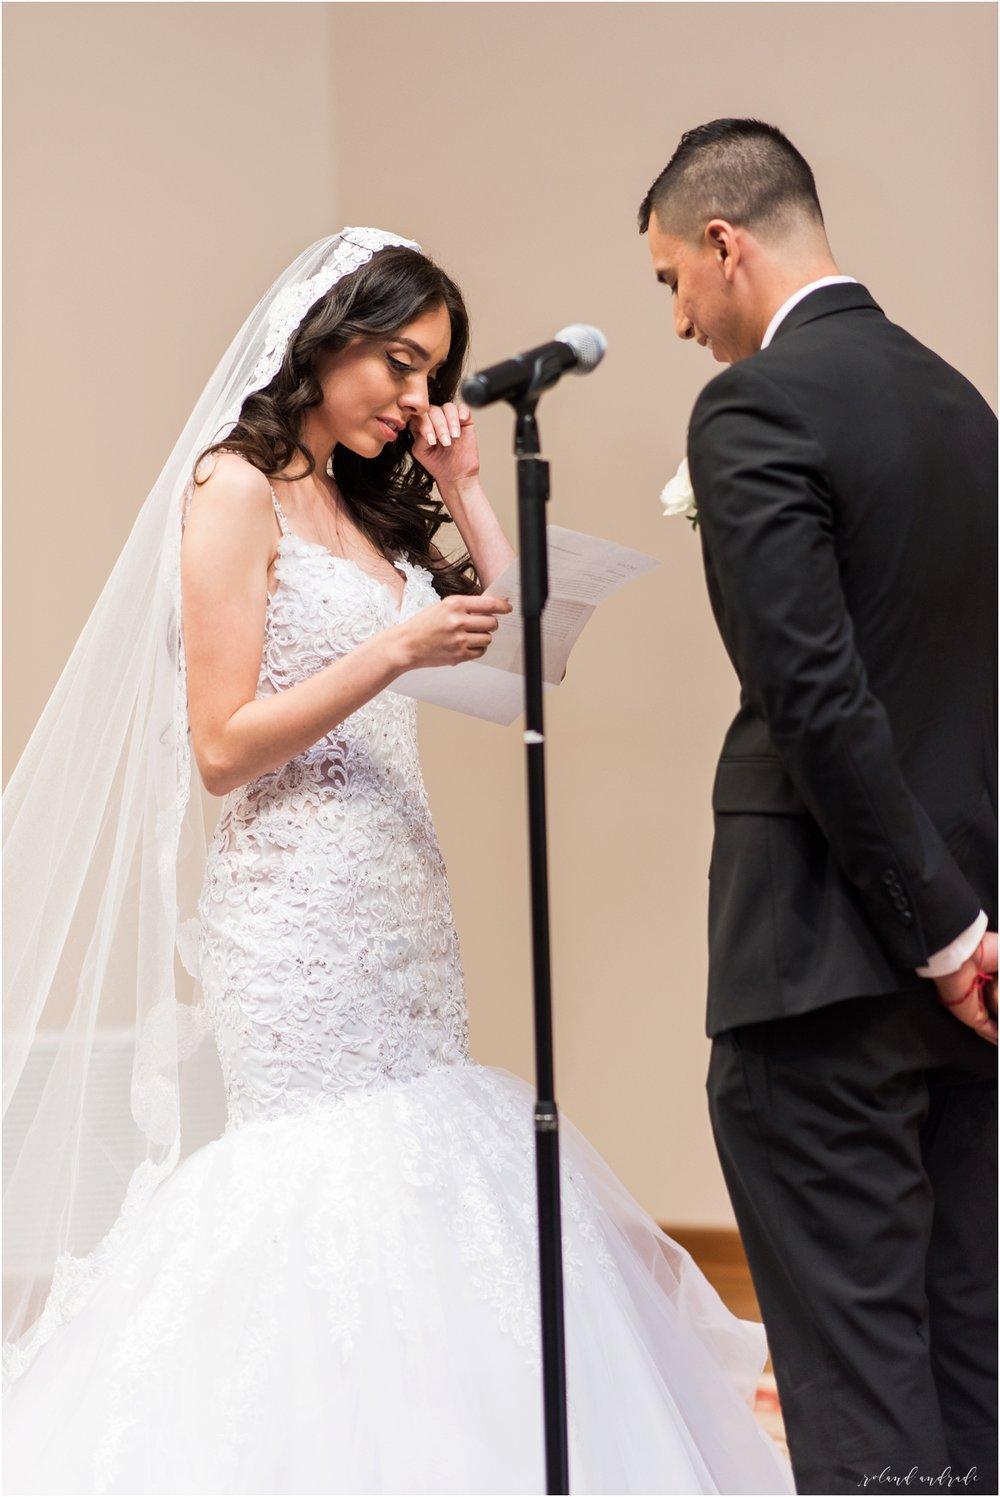 Danada House Wedding Photography Wheaton Illinois - Chicago Wedding Photography_0029.jpg